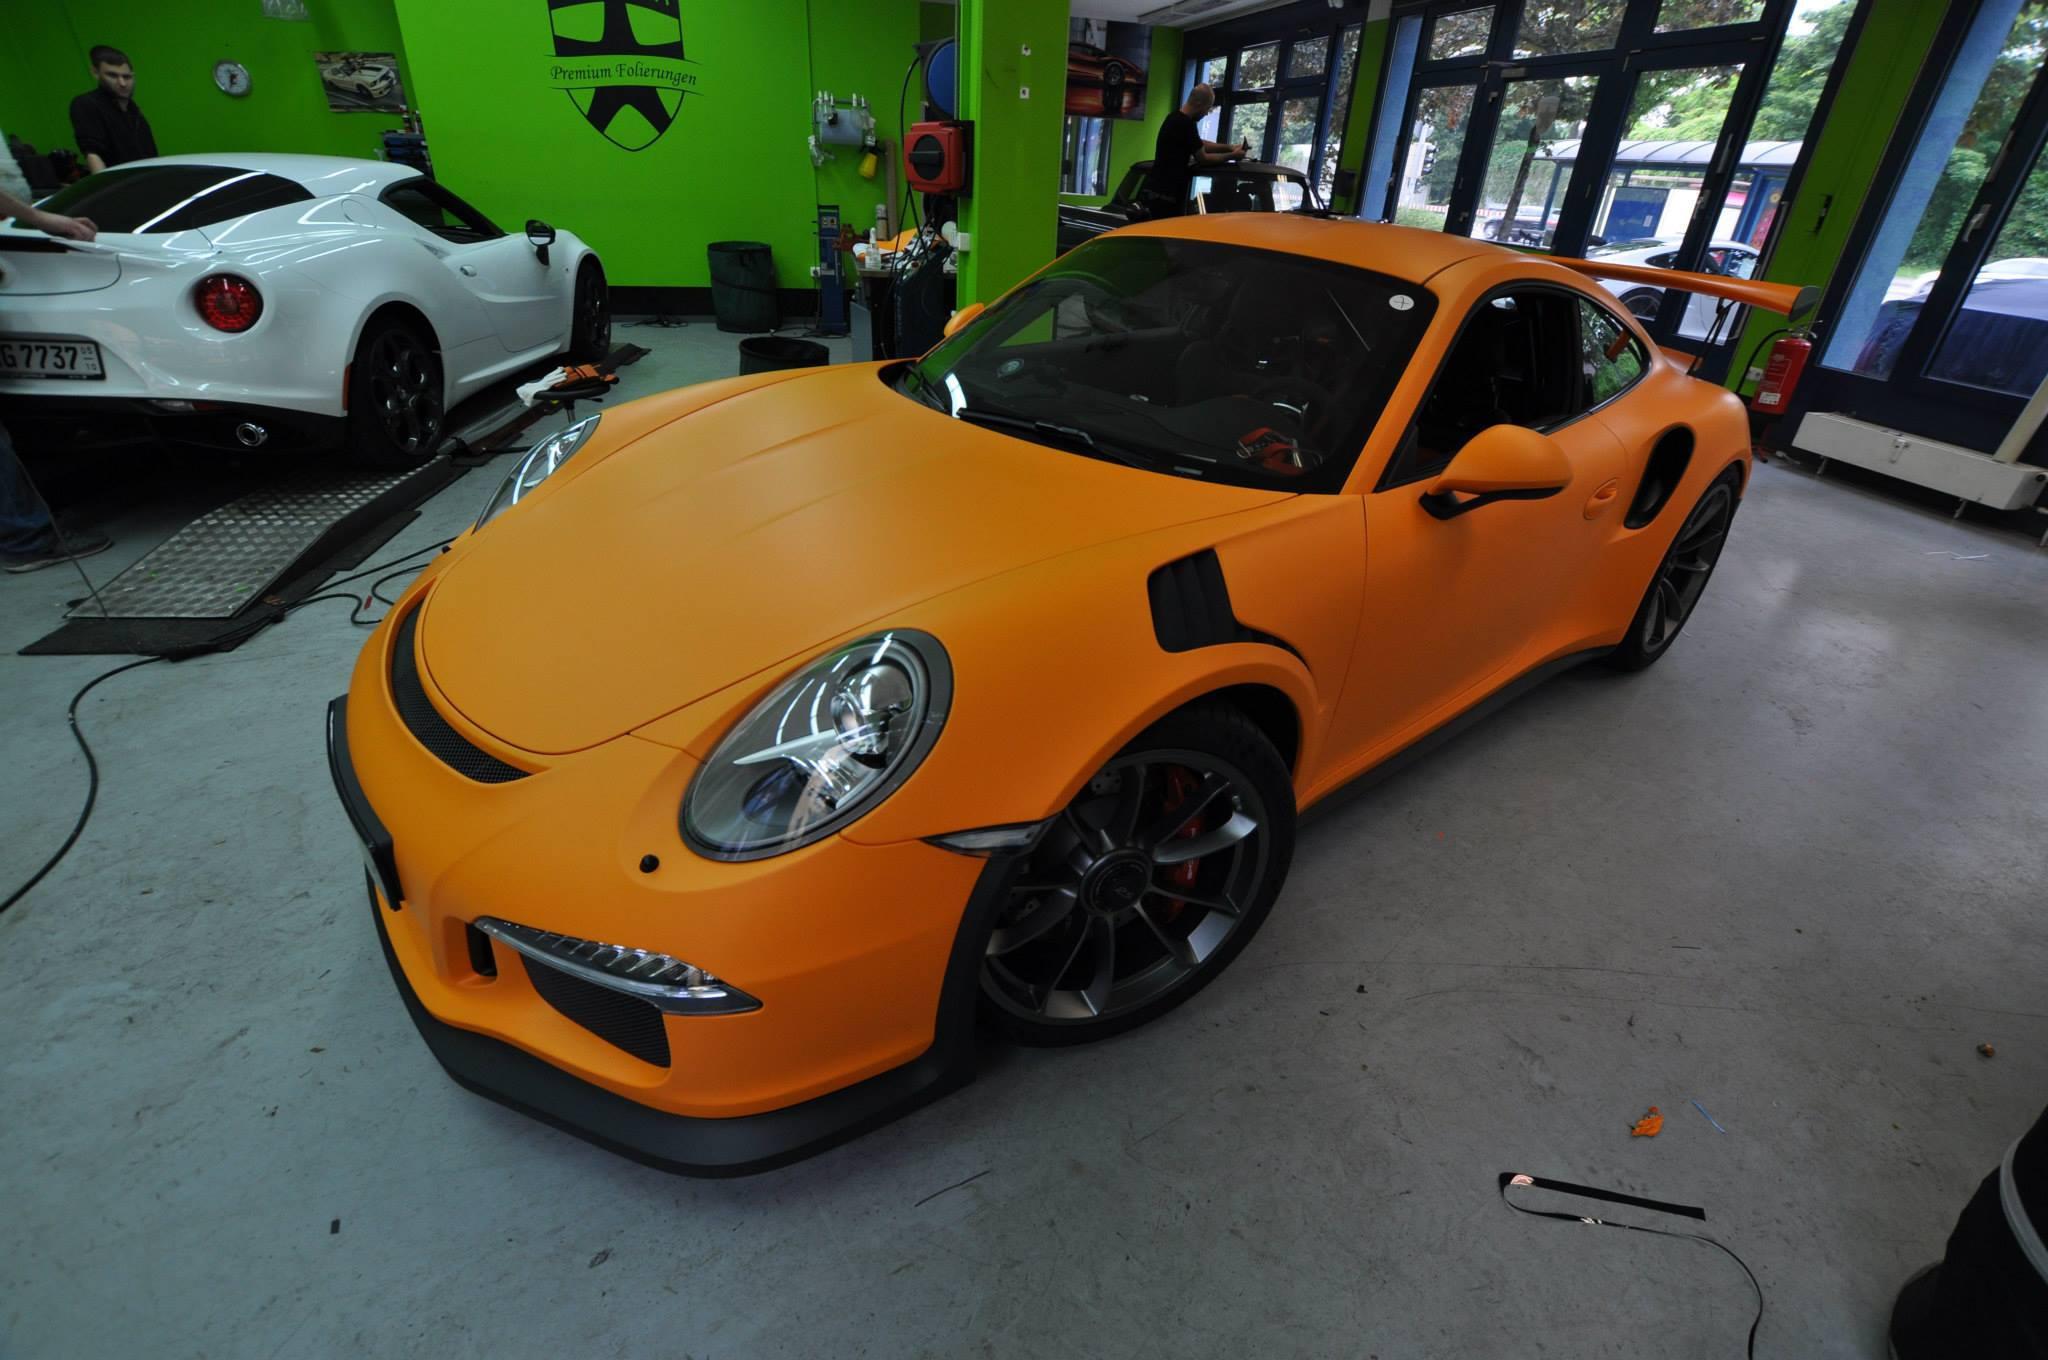 Foto de Porsche 911 GT3 RS naranja mate (1/12)